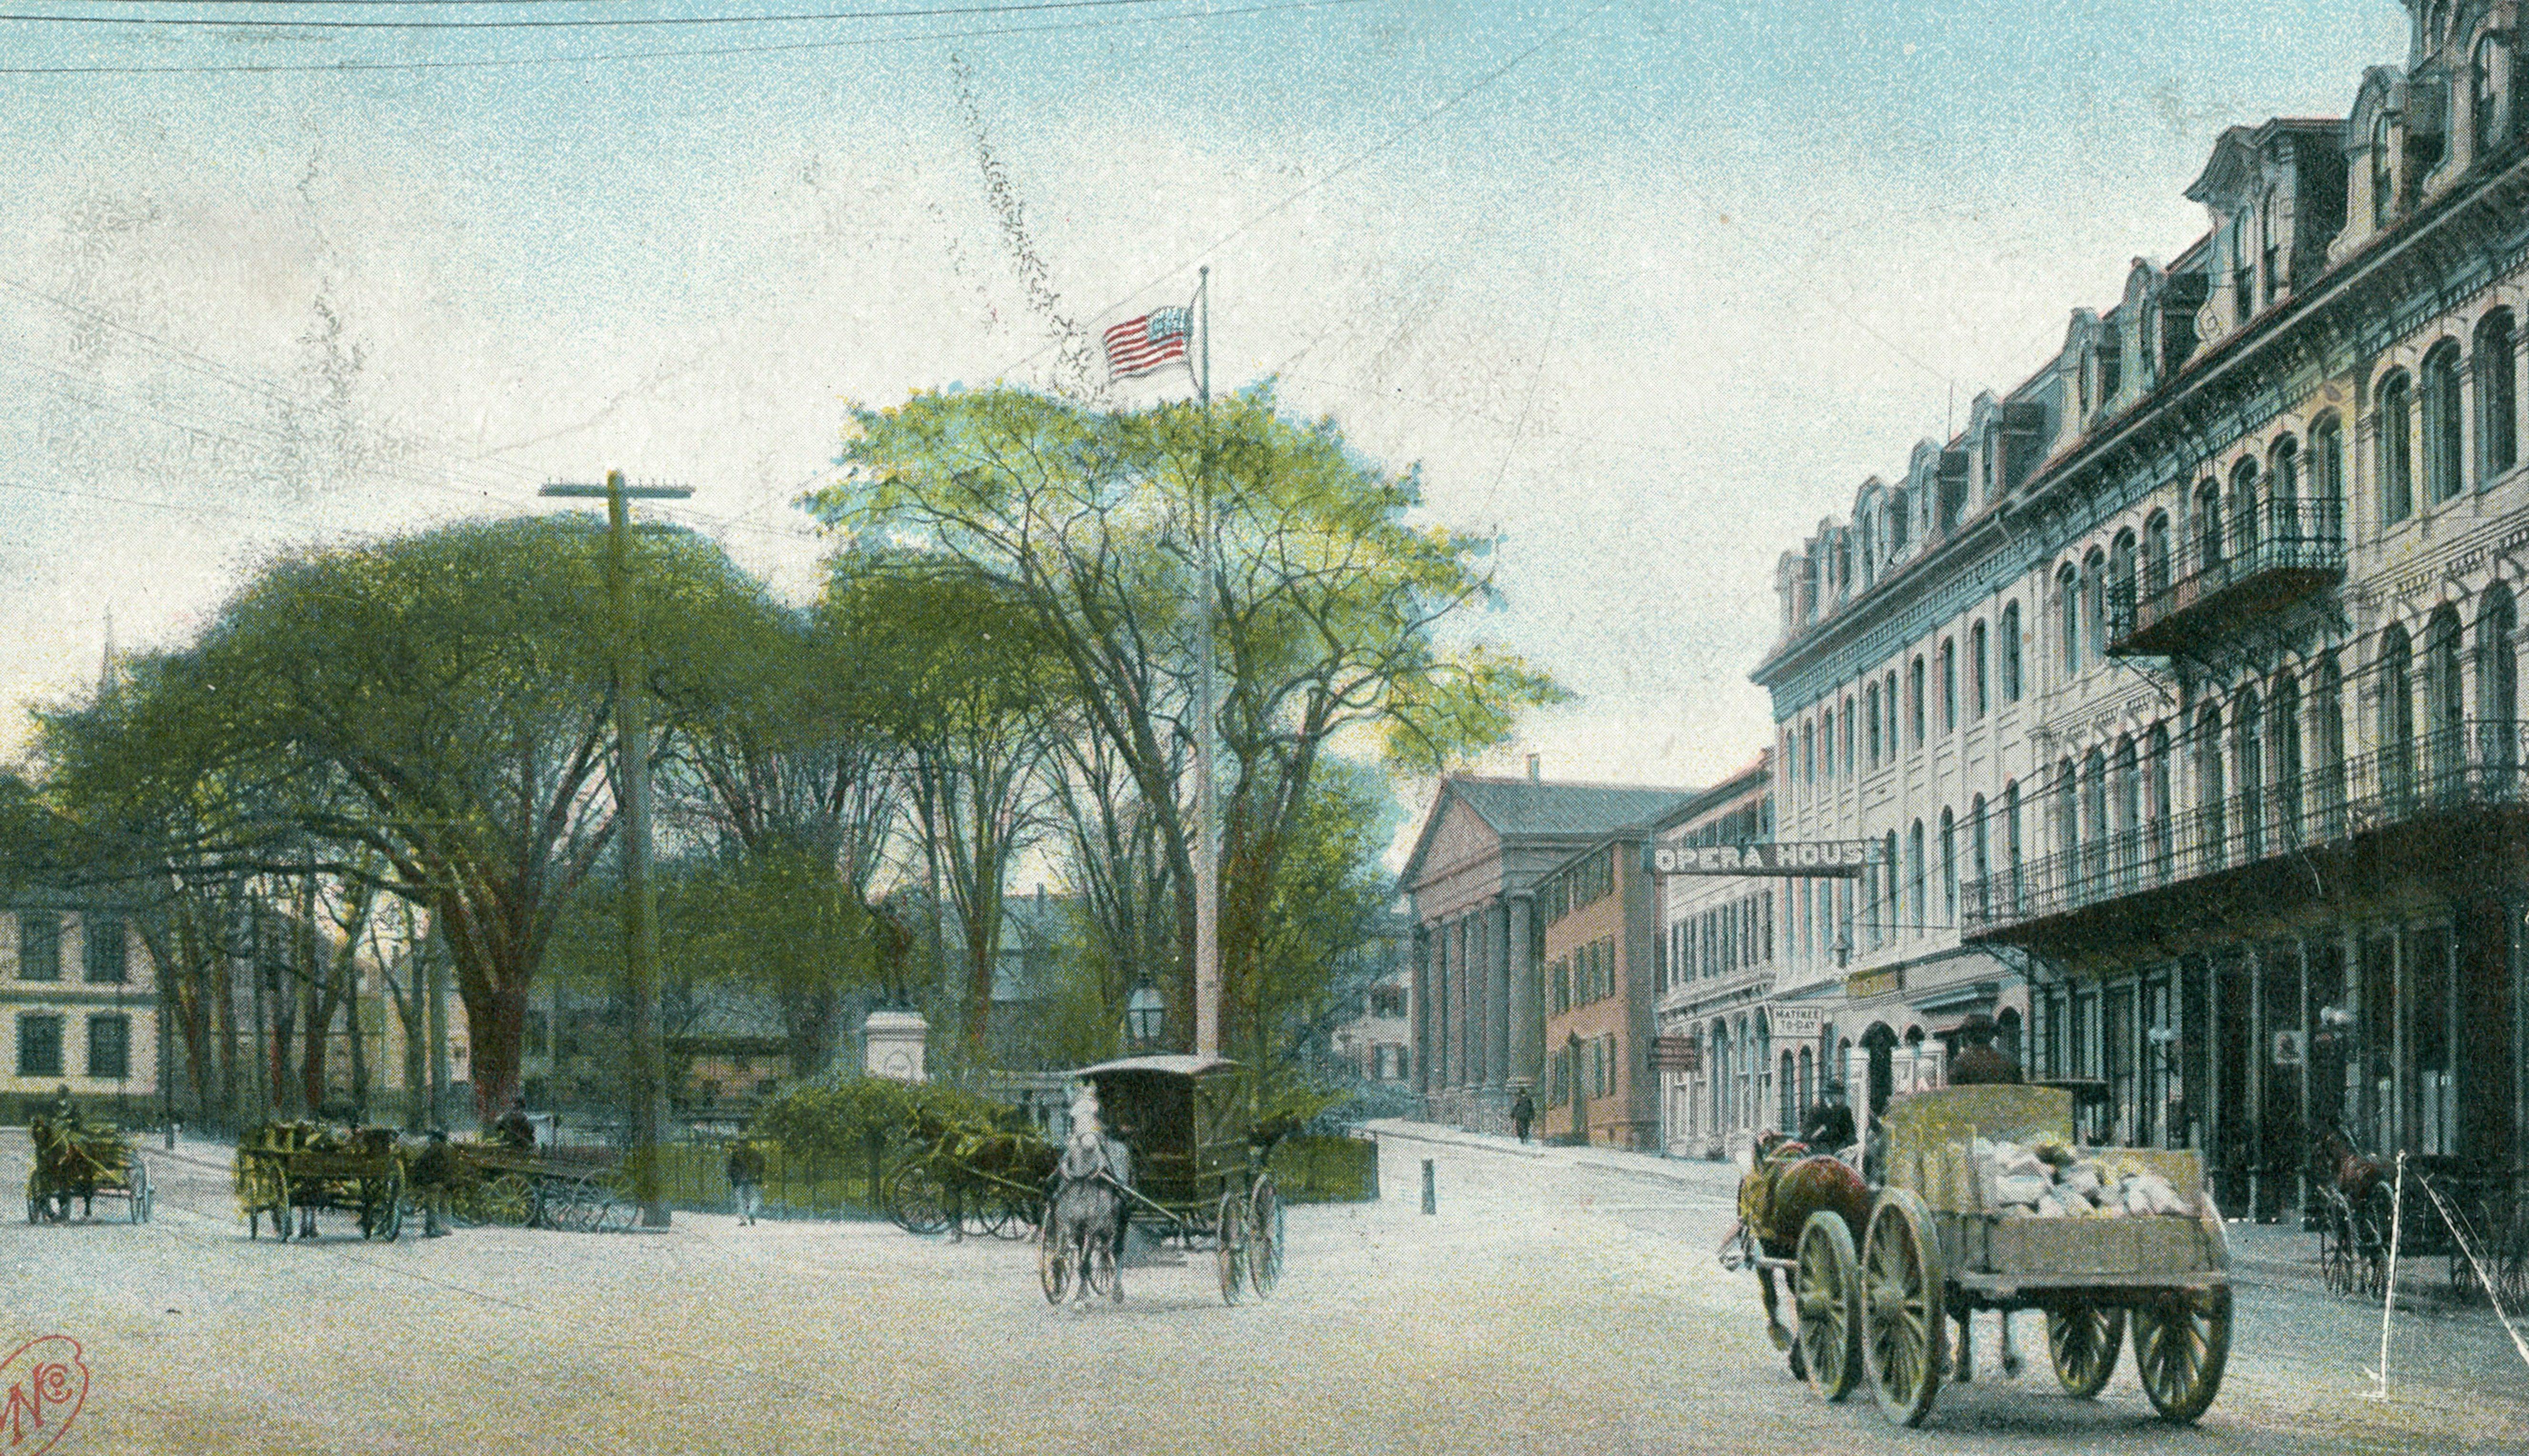 newport rhode island vintage postcard